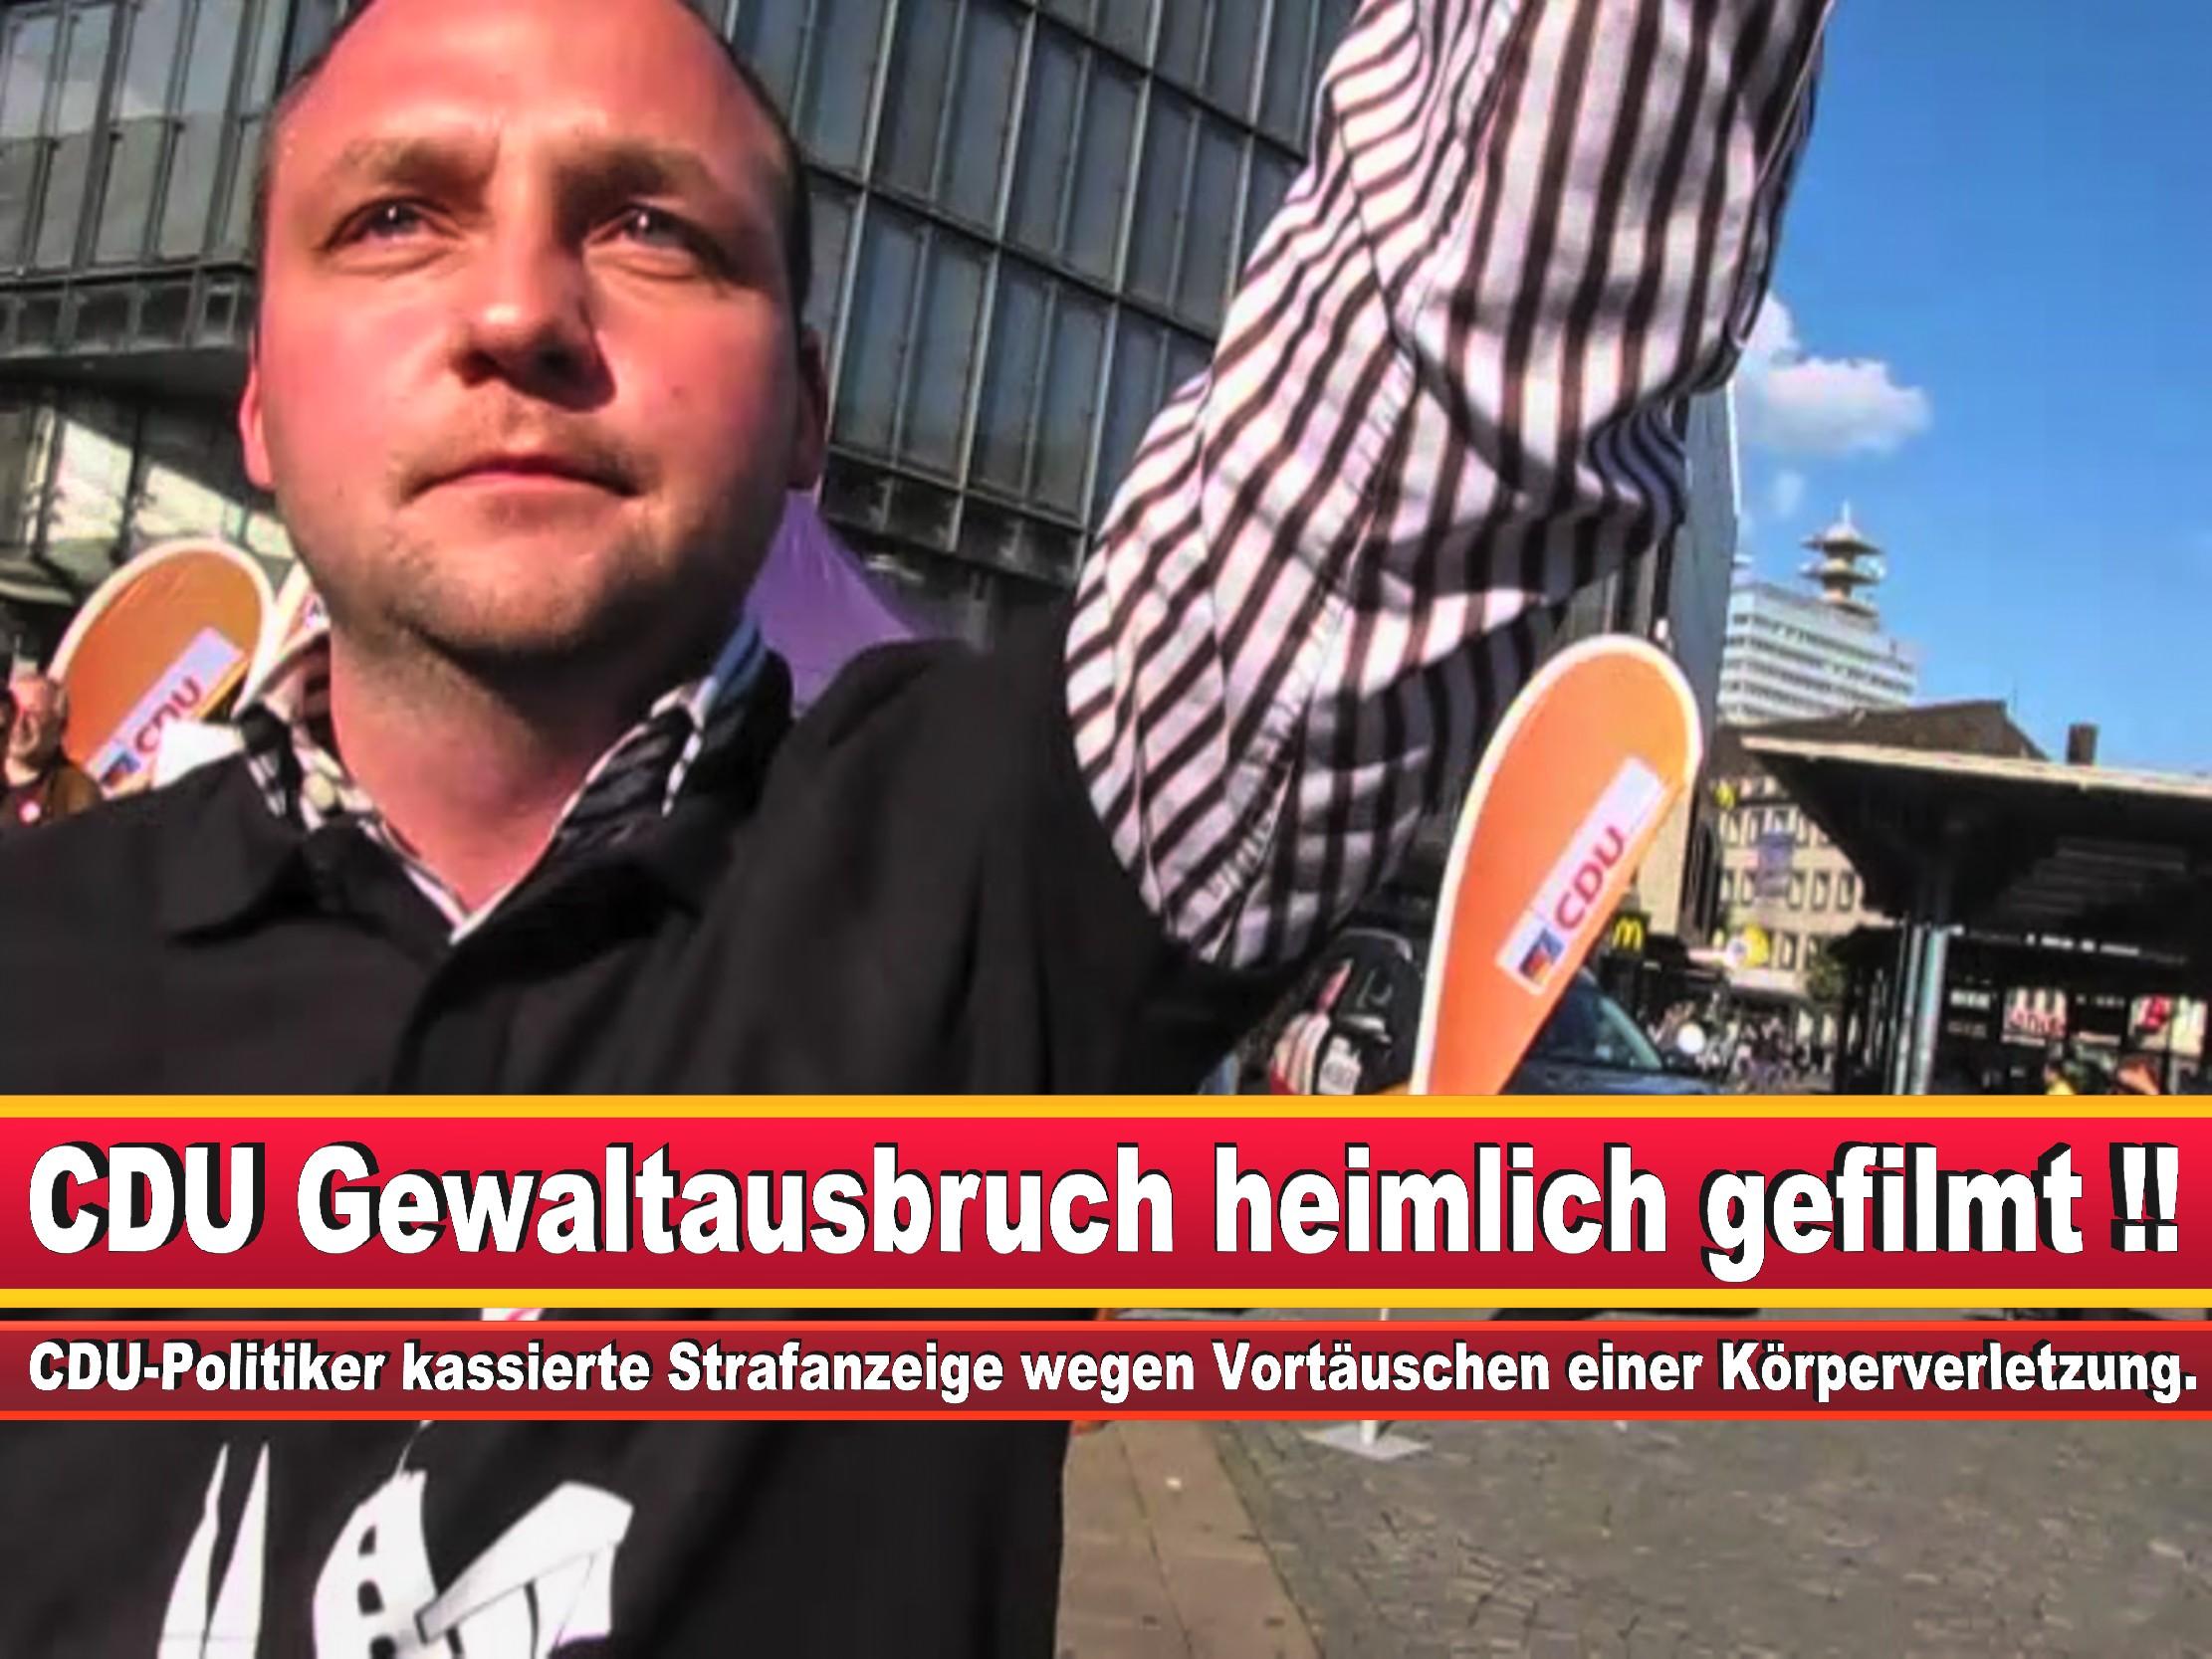 WESTFALEN BLATT GüTERSLOH LOKALSPORT